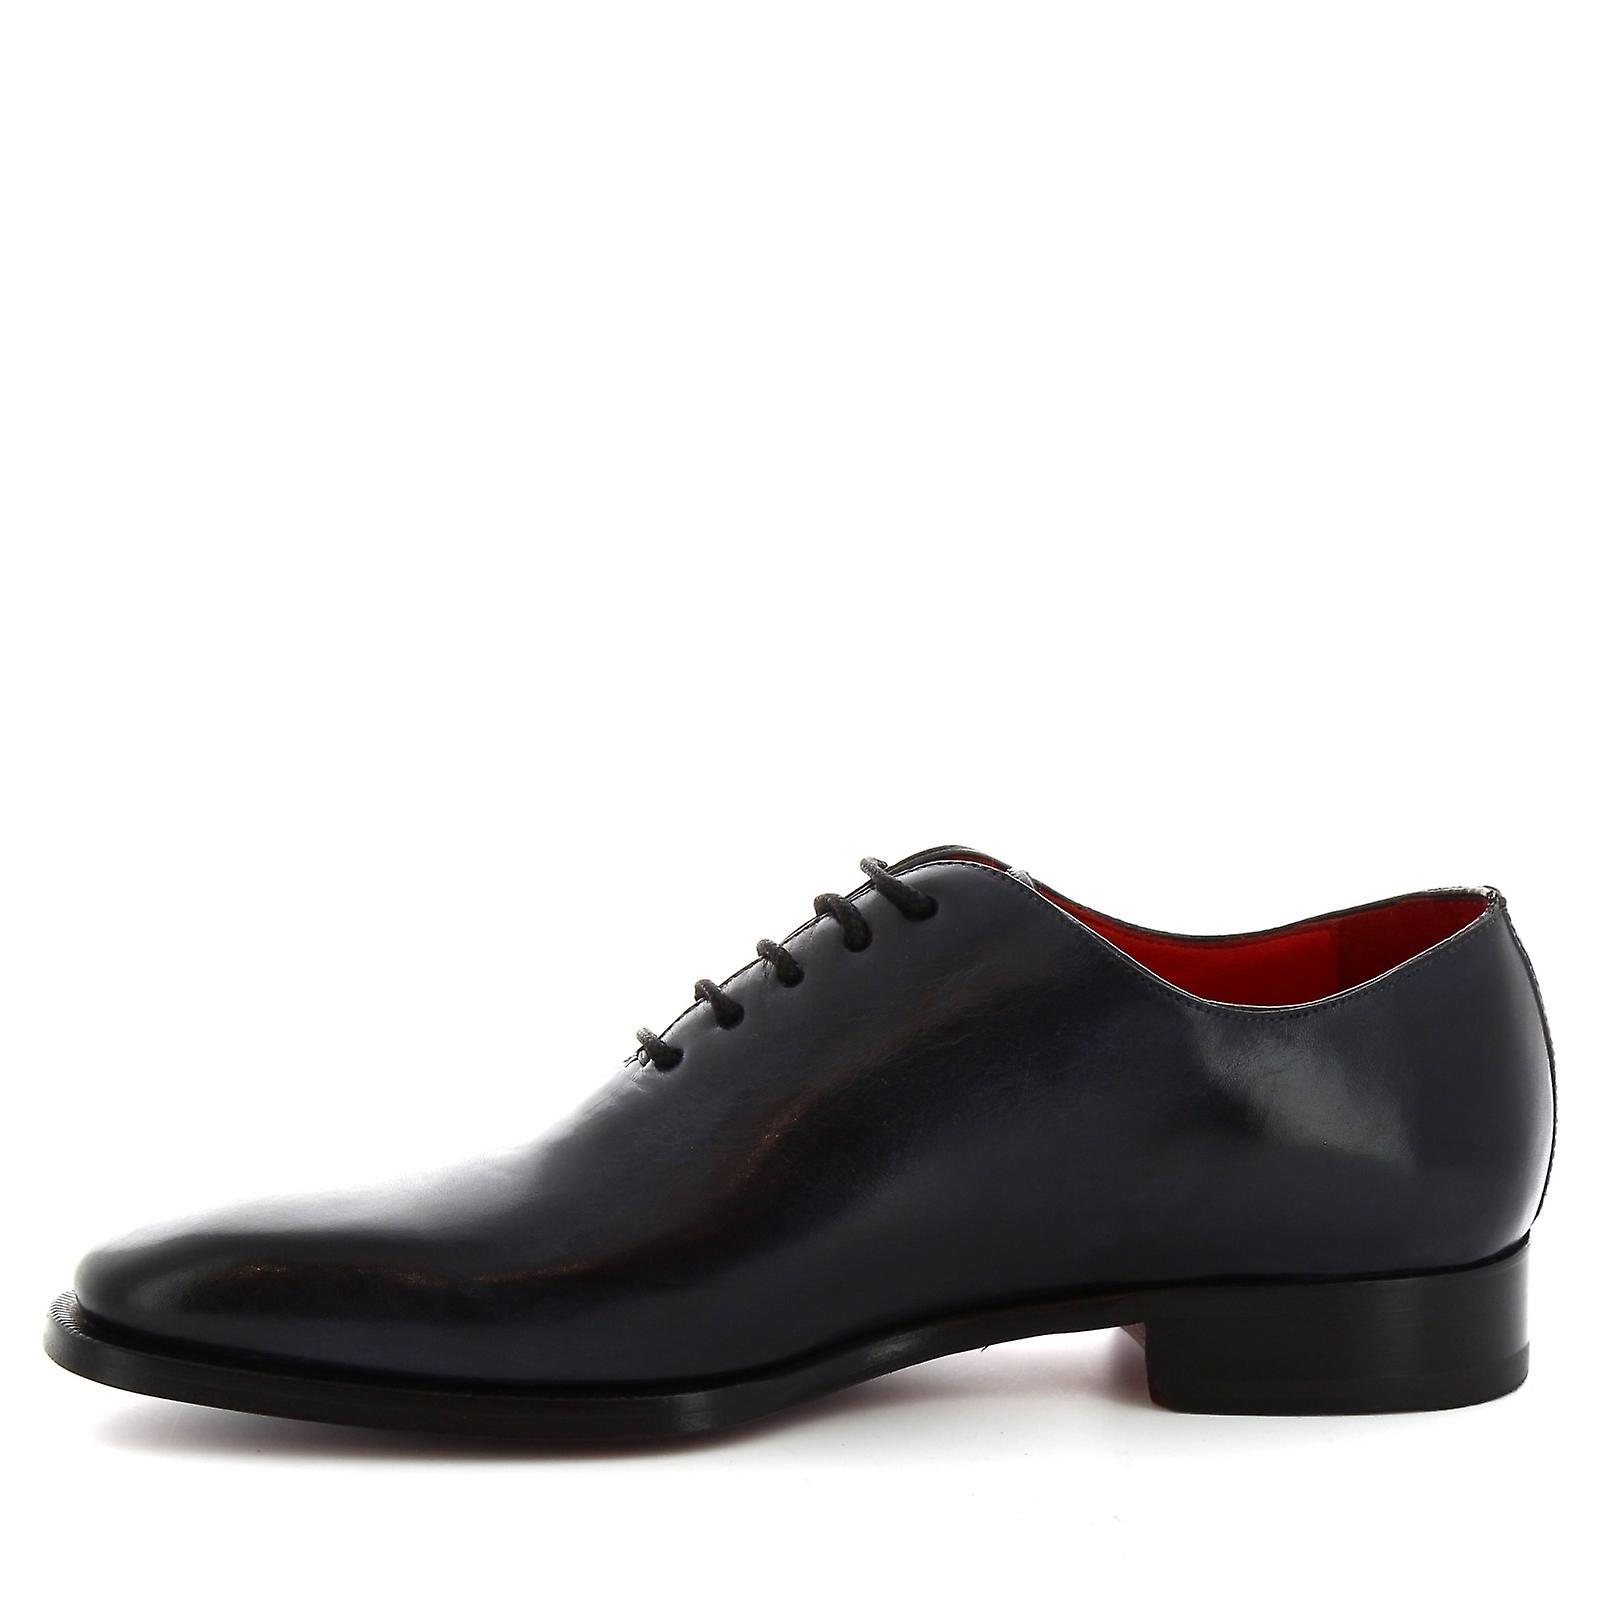 Leonardo Shoes 8728e19vitellodelavéblu Men's Blue Leather Lace-up Shoes L6irKC